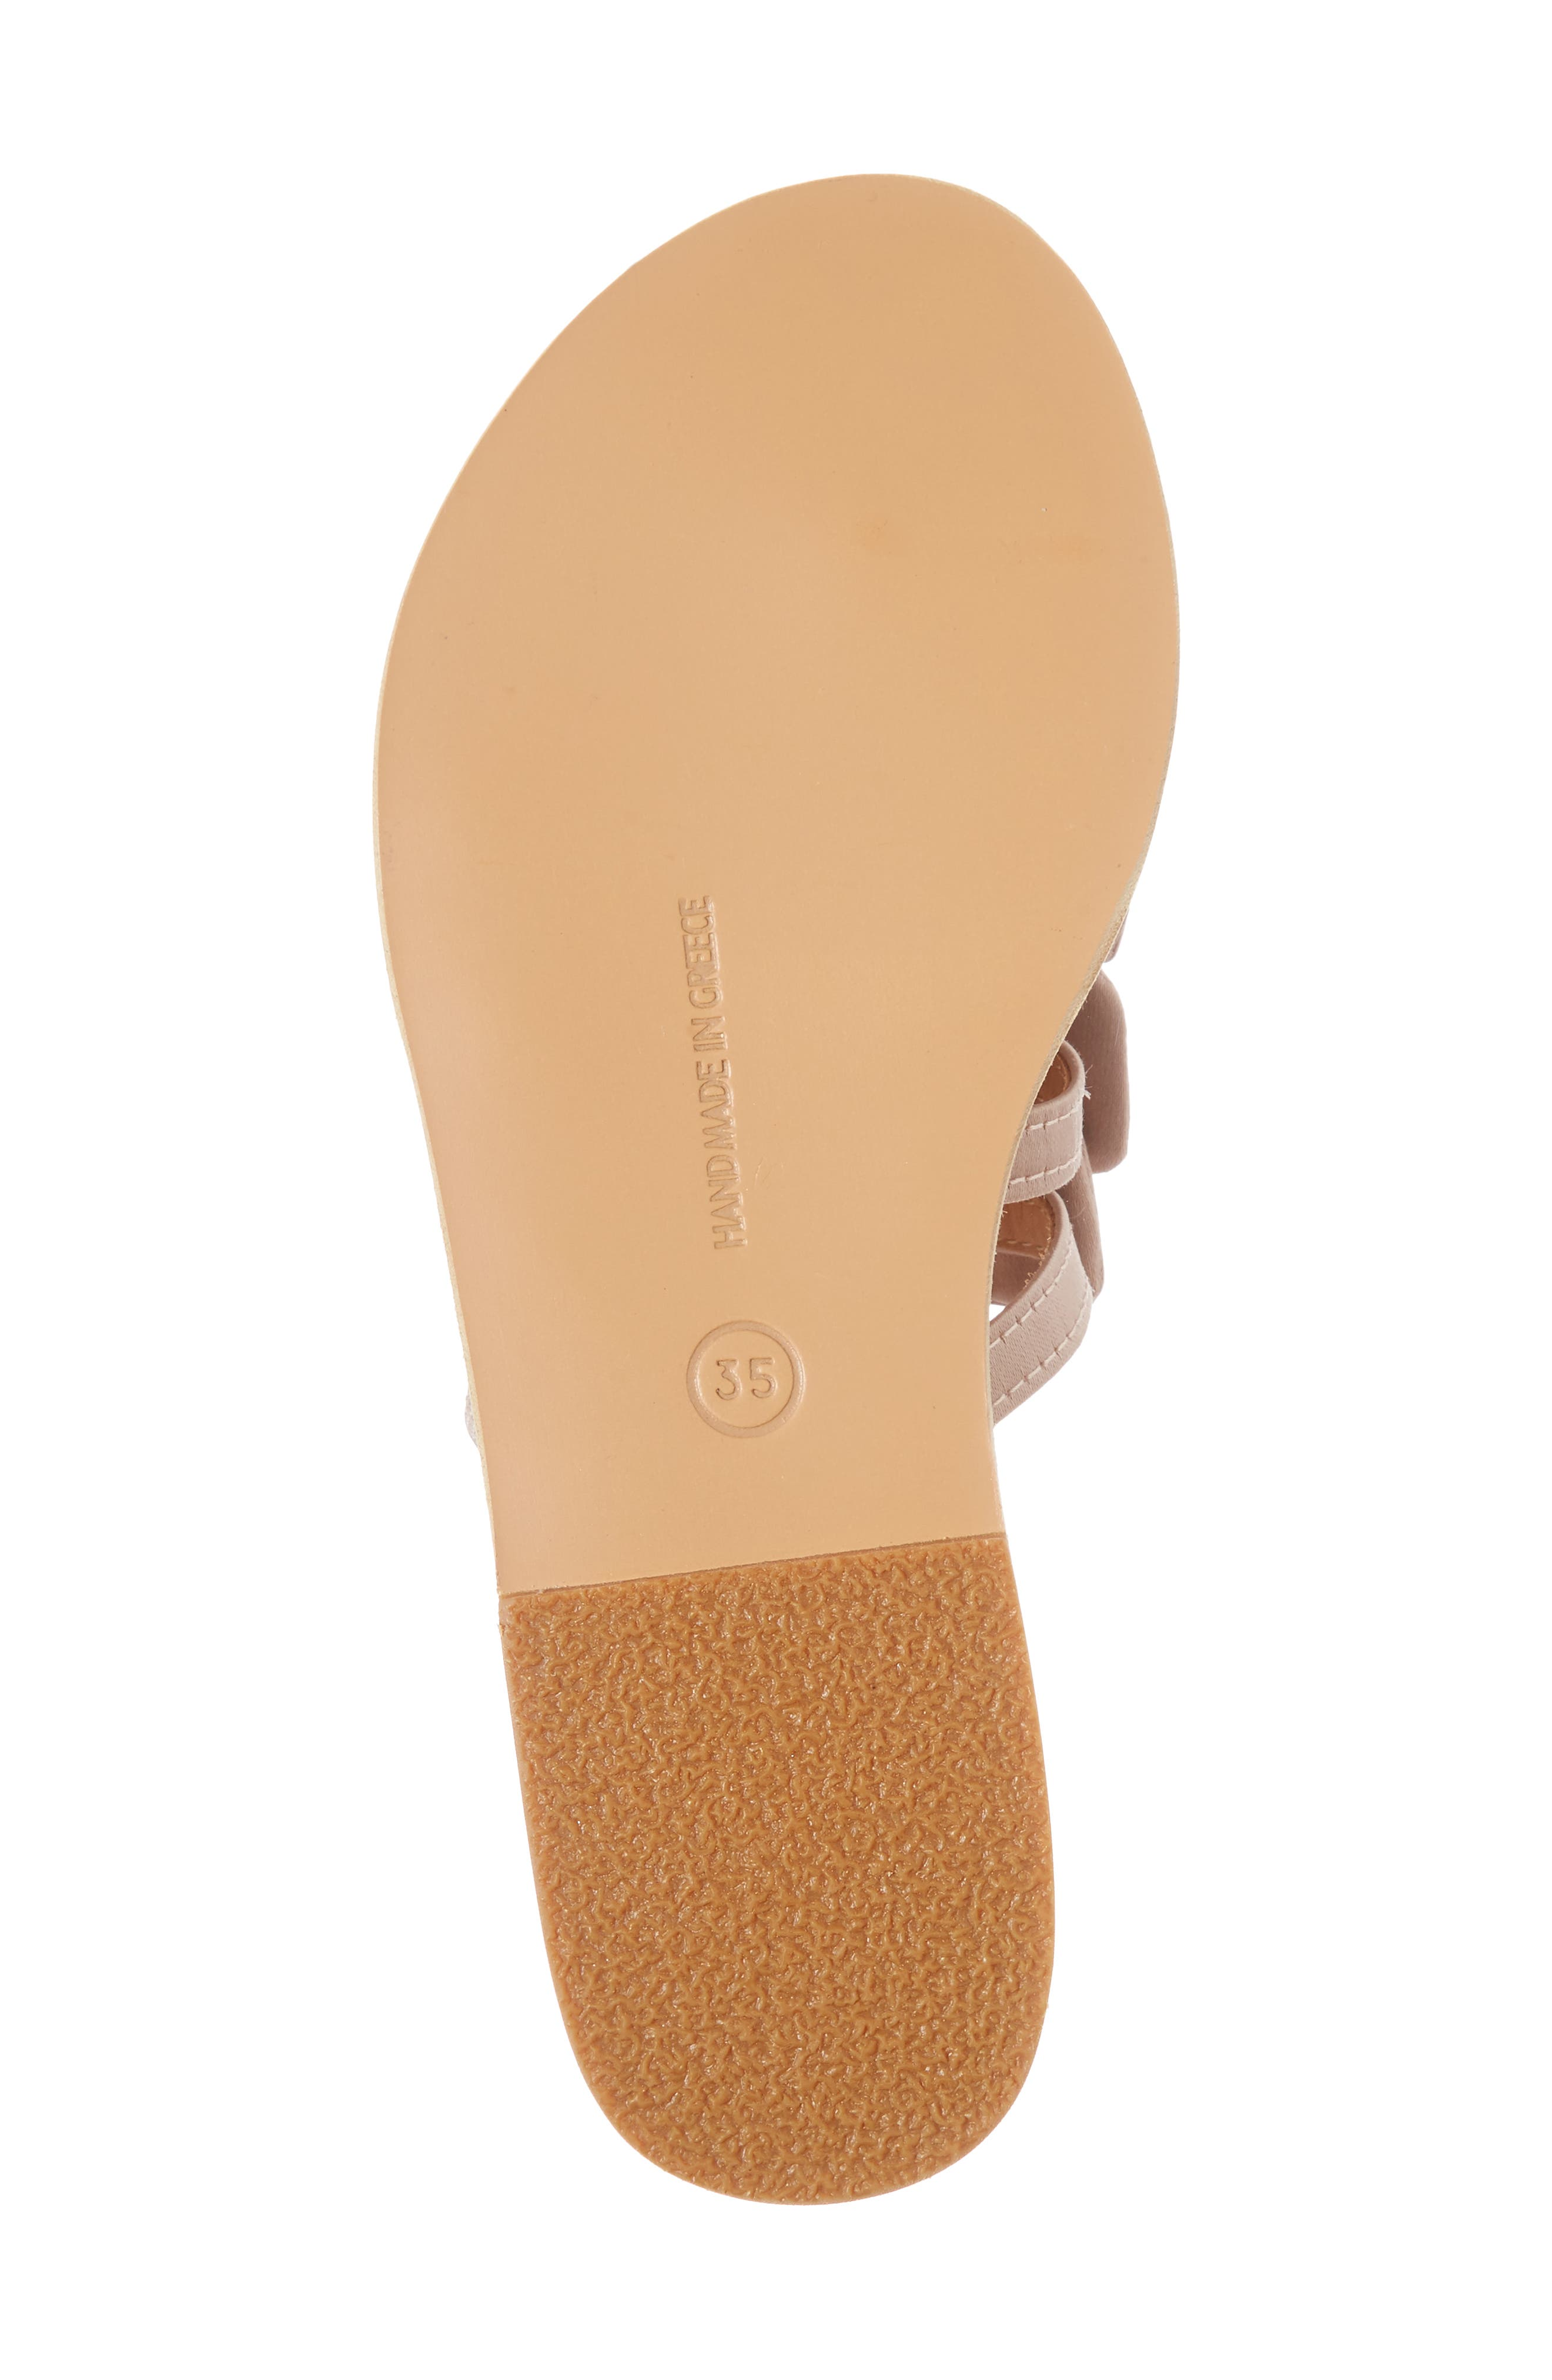 Hara Toe Loop Slide Sandal,                             Alternate thumbnail 6, color,                             650